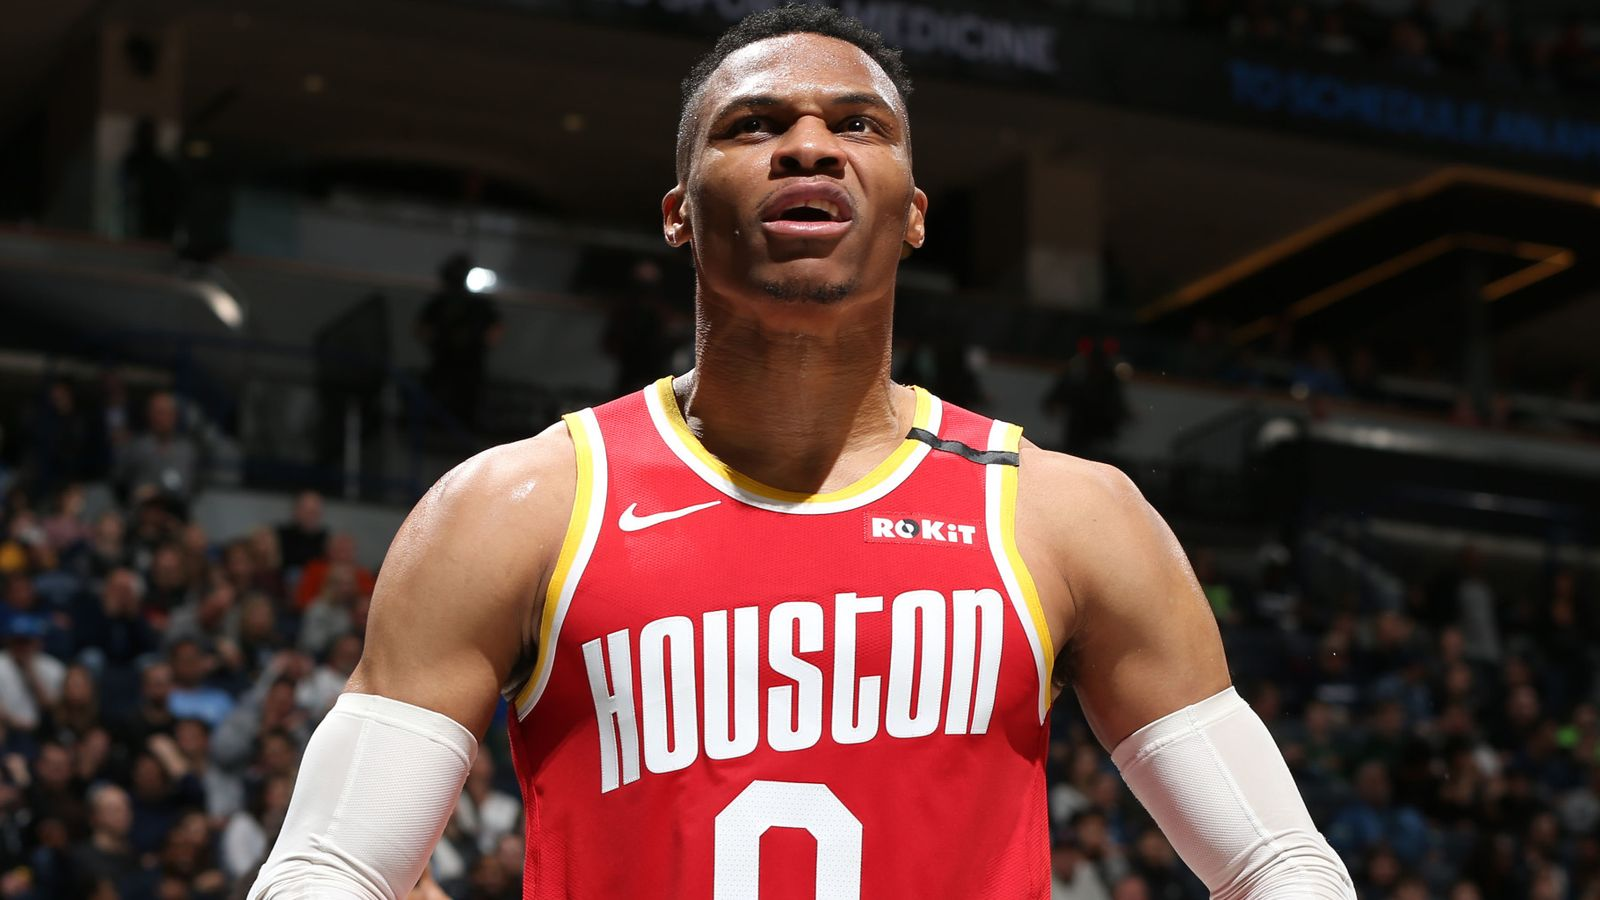 NBA Sunday on Sky Sports: Rockets @ Blazers followed by Thunder @ Wizards